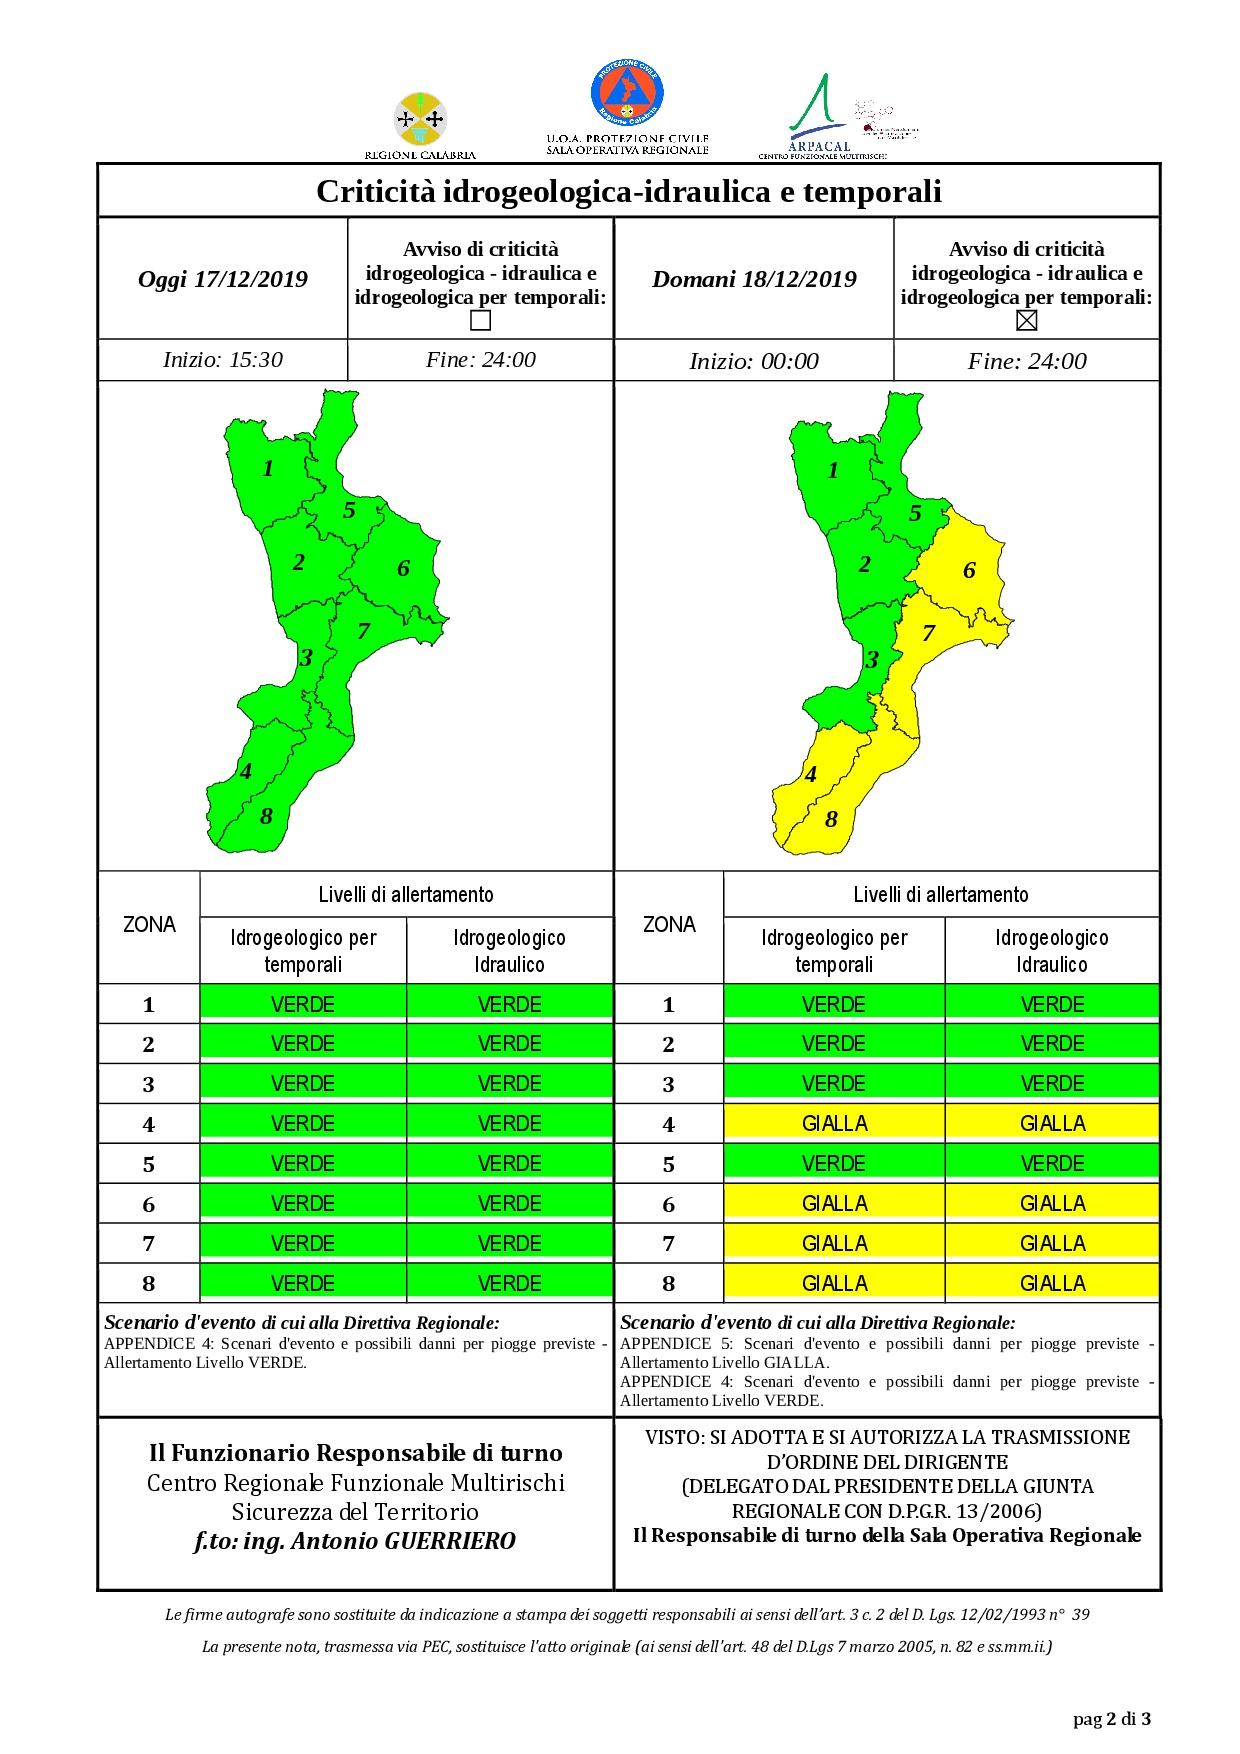 Criticità idrogeologica-idraulica e temporali in Calabria 17-12-2019